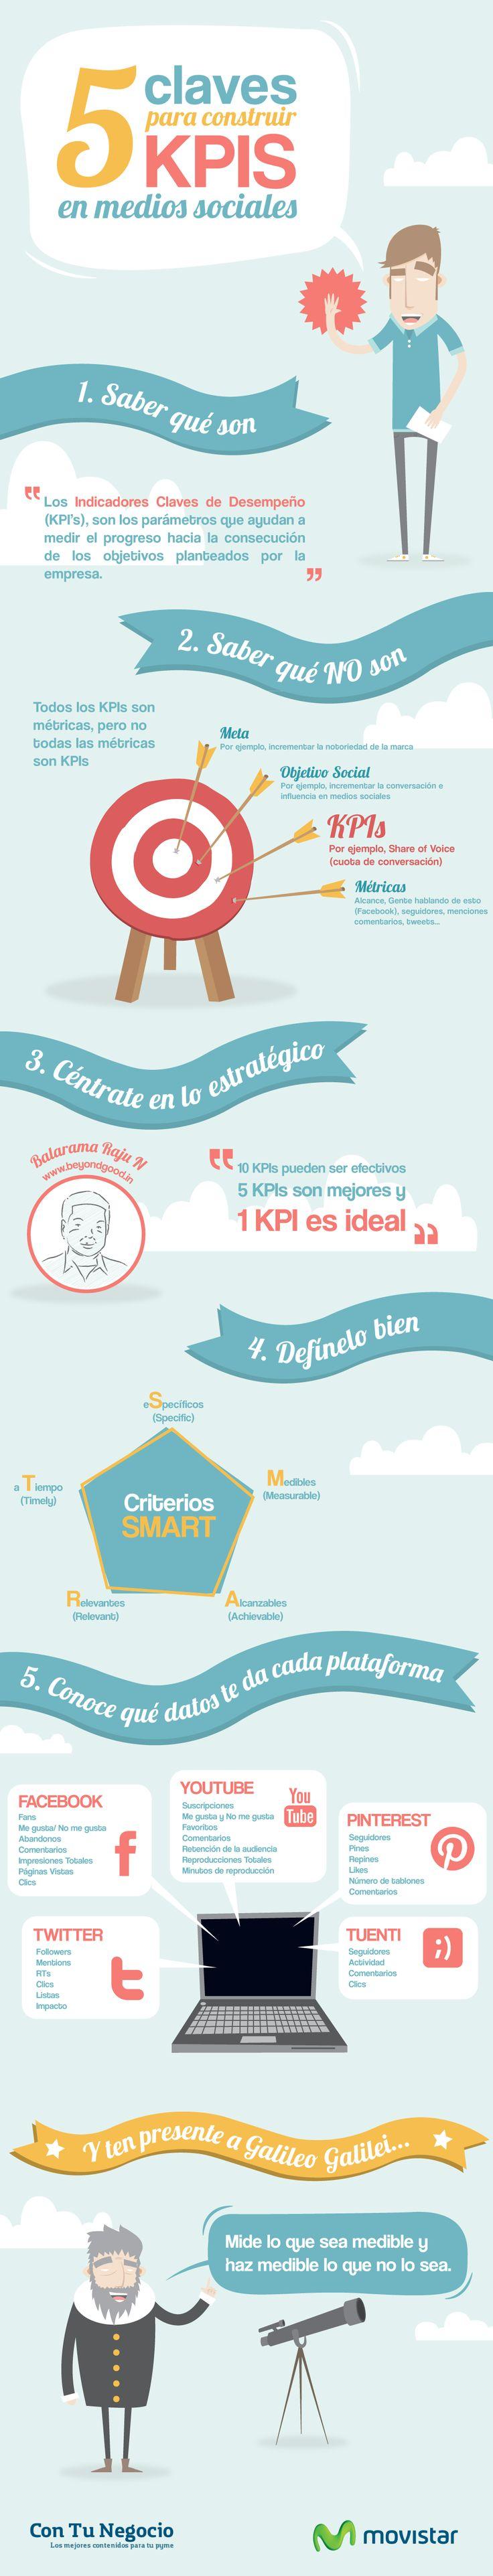 5 claves para construir KPI en Social Media. Infografía en español. #CommunityManager